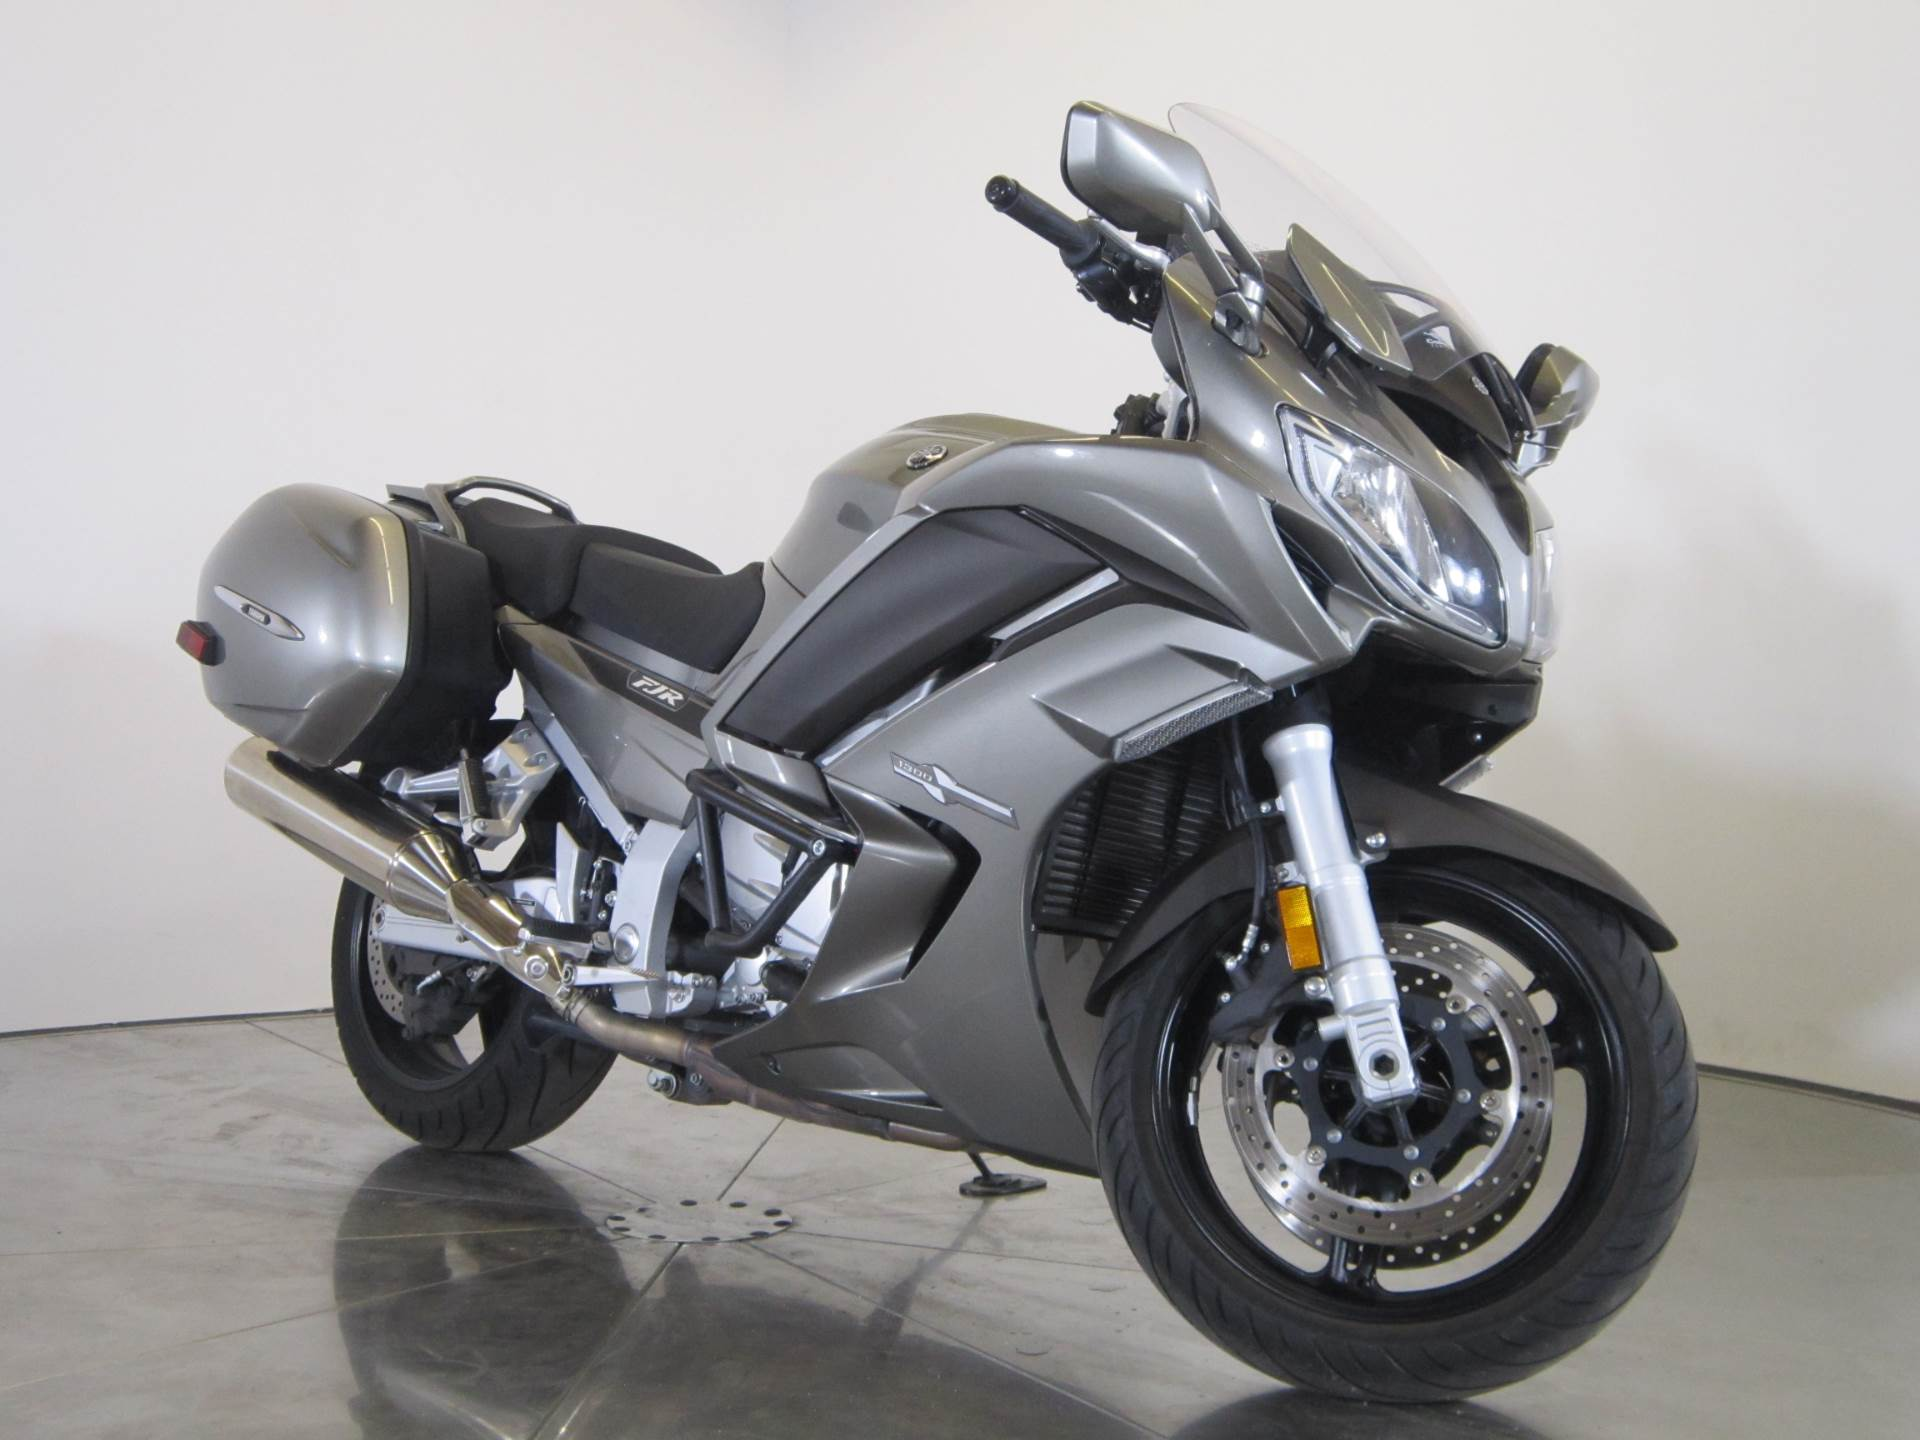 2013 Yamaha FJR1300A 6